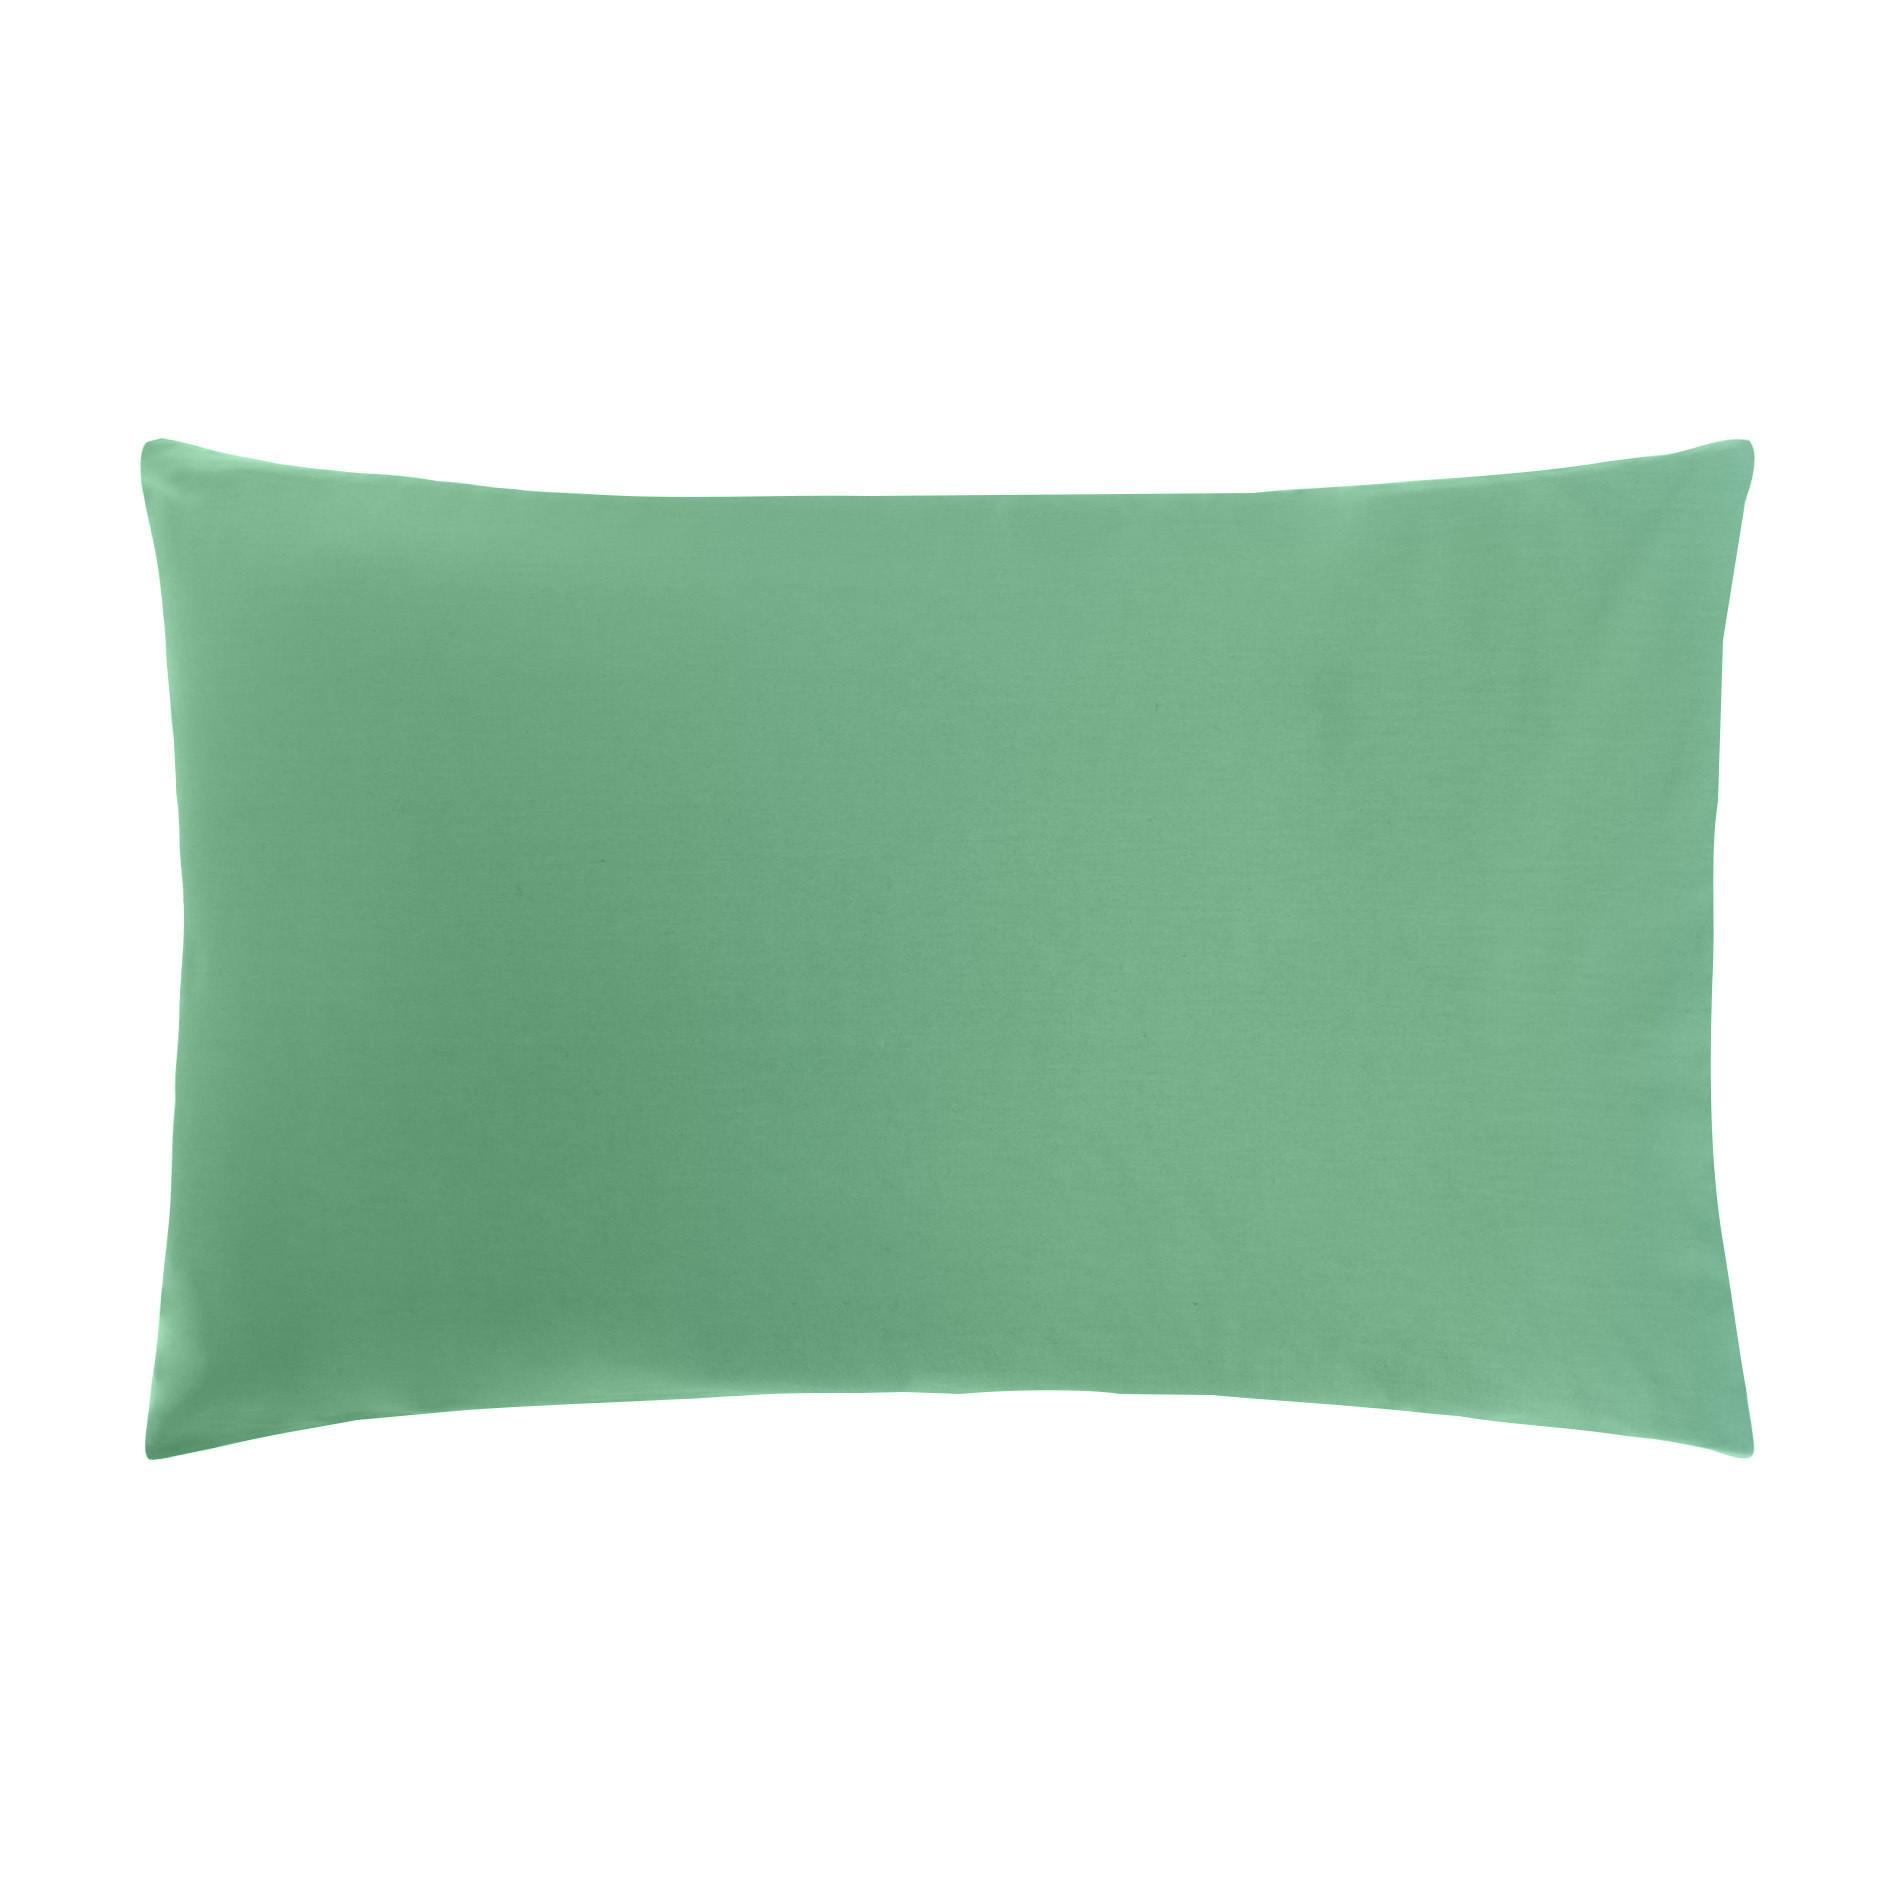 Federa puro cotone tinta unita, Verde smeraldo, large image number 0